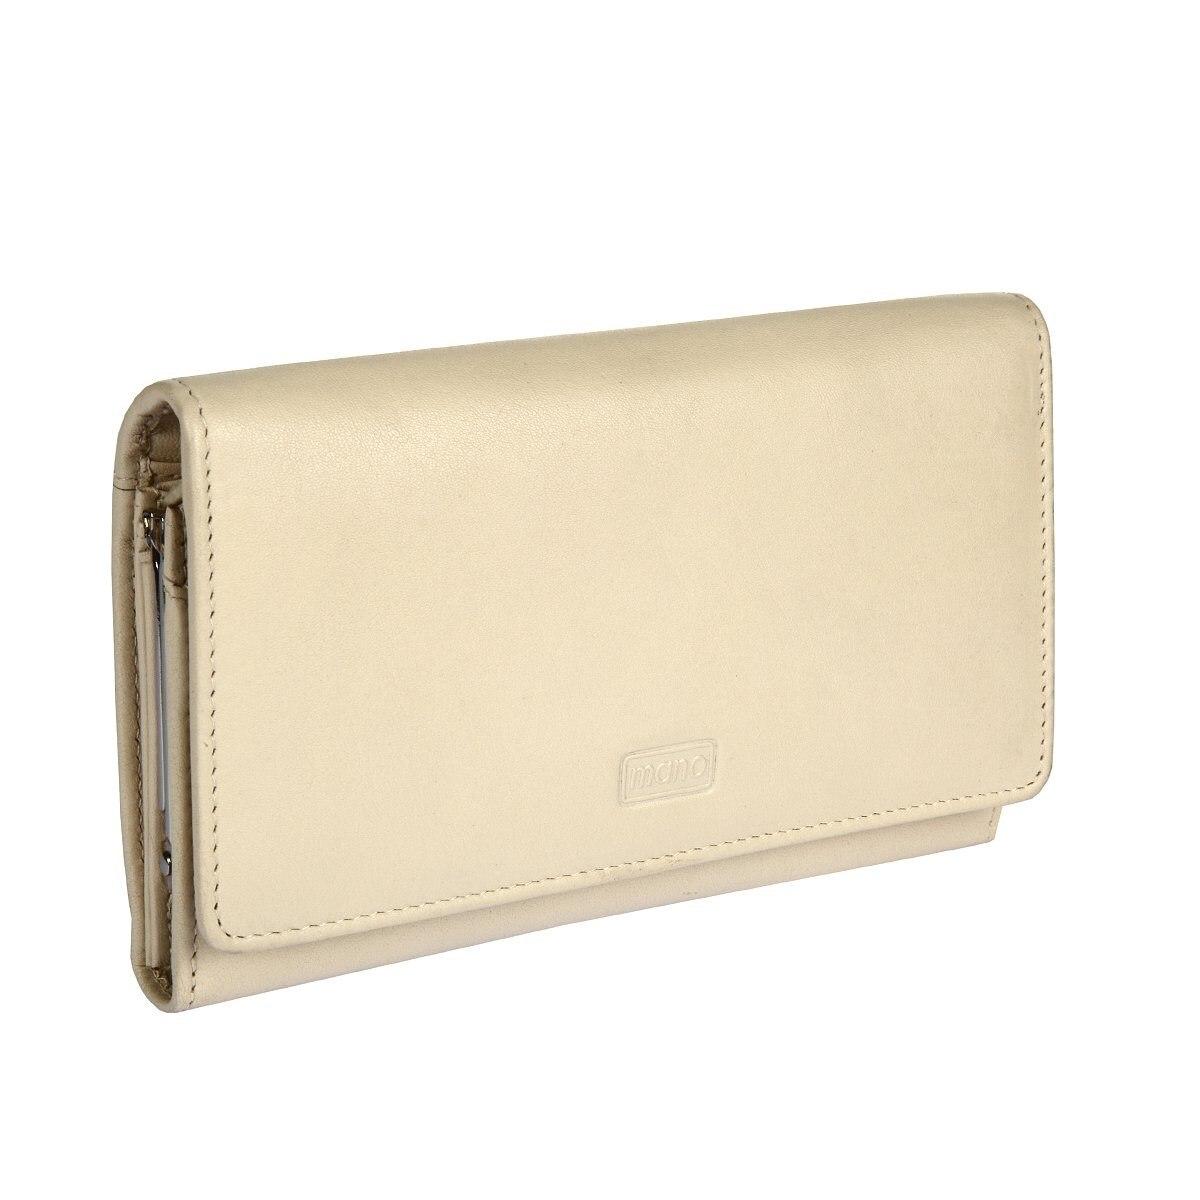 Purse Mano 13407 SETRU off white кошельки бумажники и портмоне mano 20103 setru black